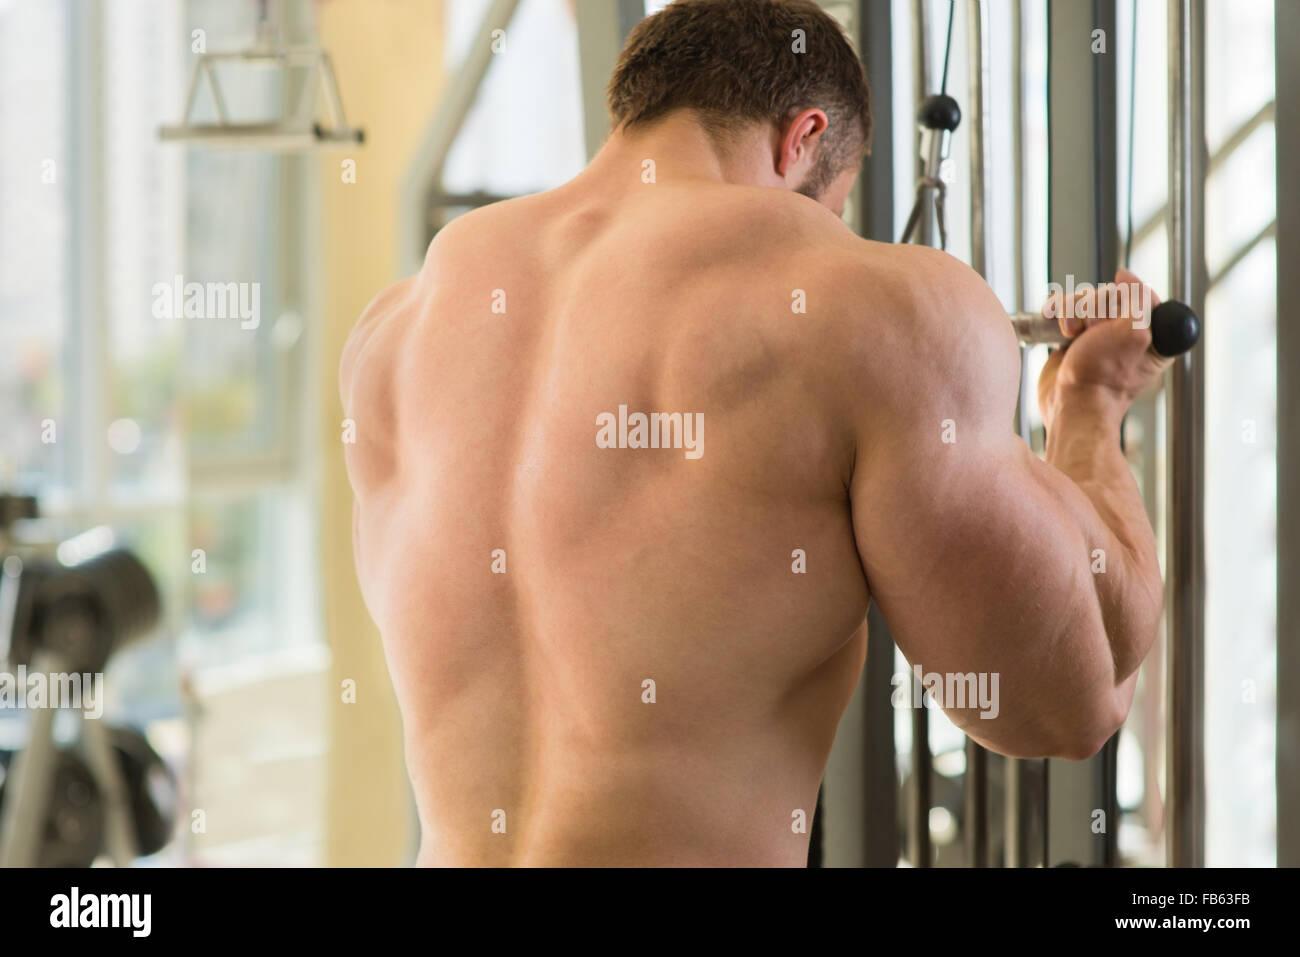 Muscular man's back. - Stock Image